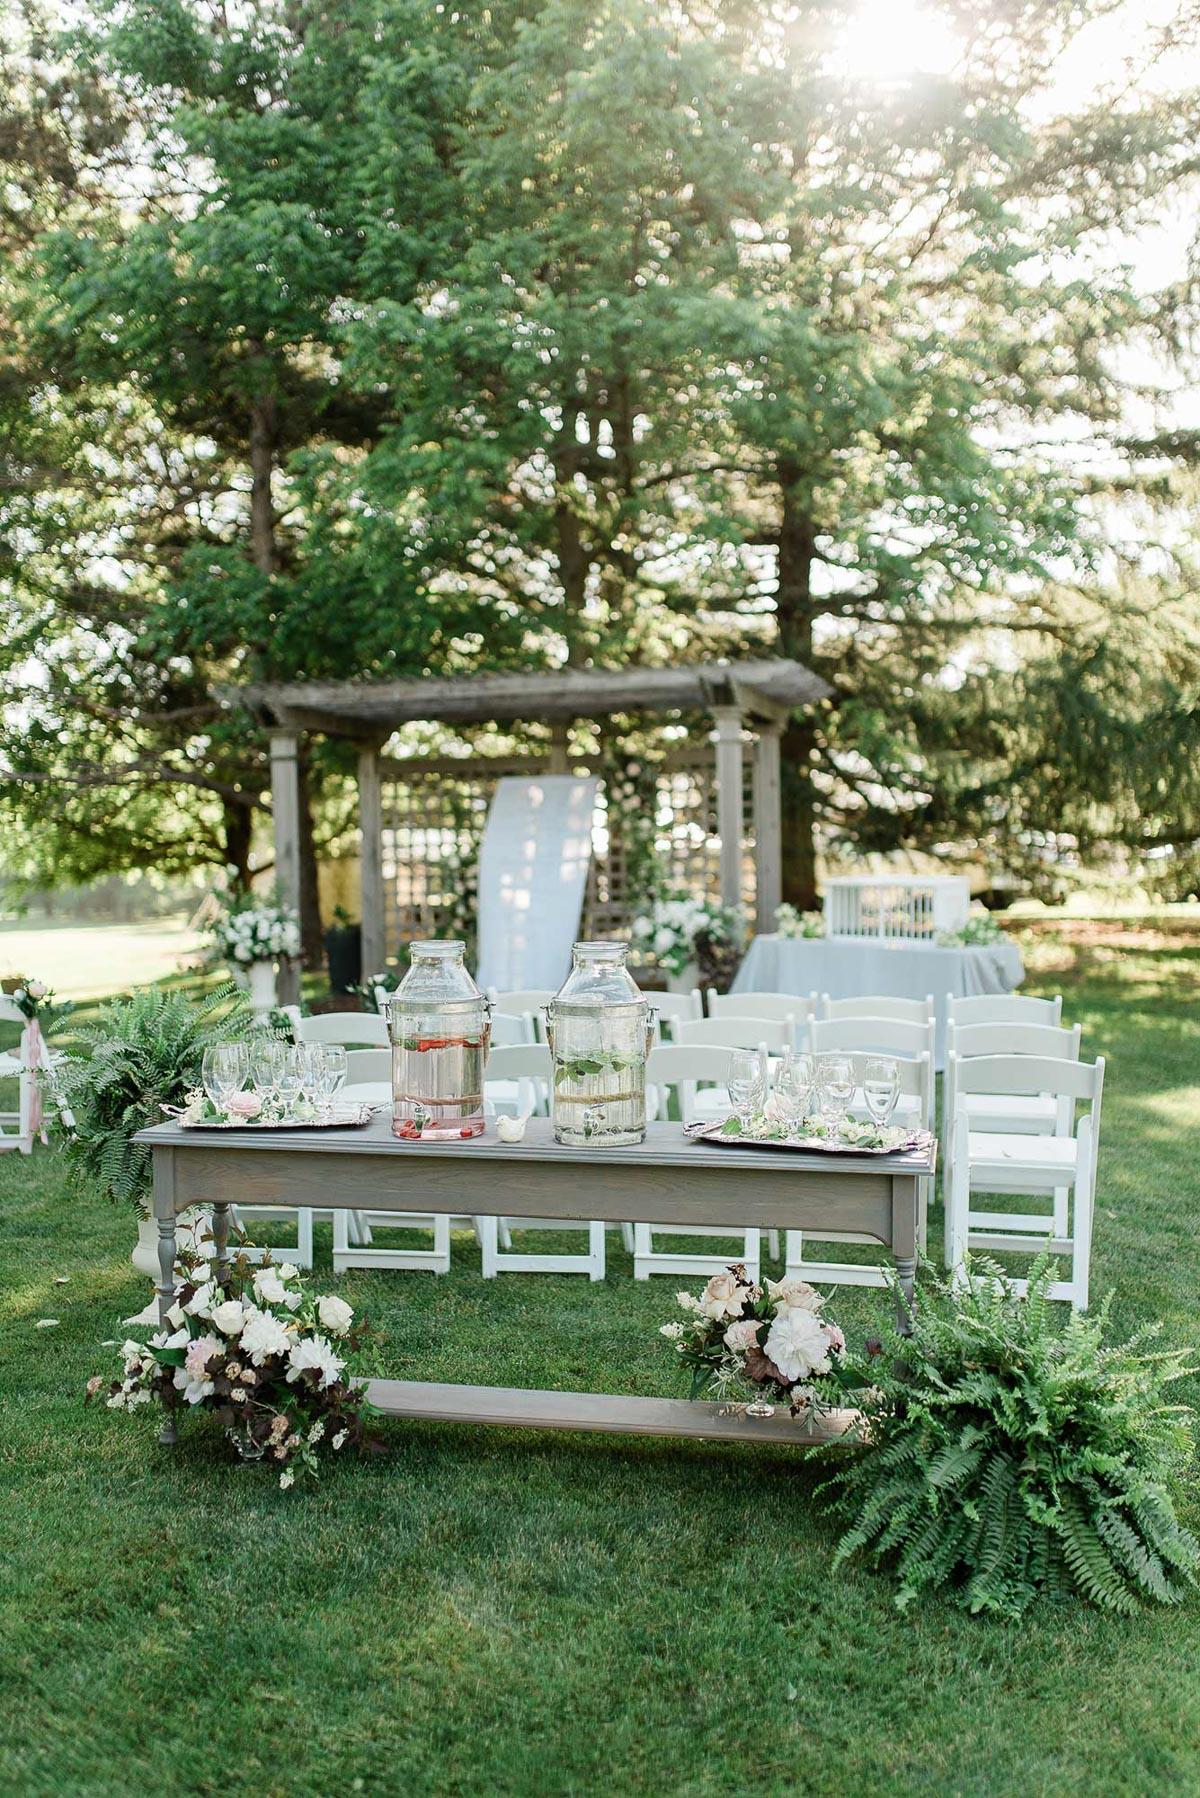 destiny-dawn-photography-vineyard-bride-swish-list-knollwood-golf-and-country-club-ancaster-wedding-editorial-9.jpg